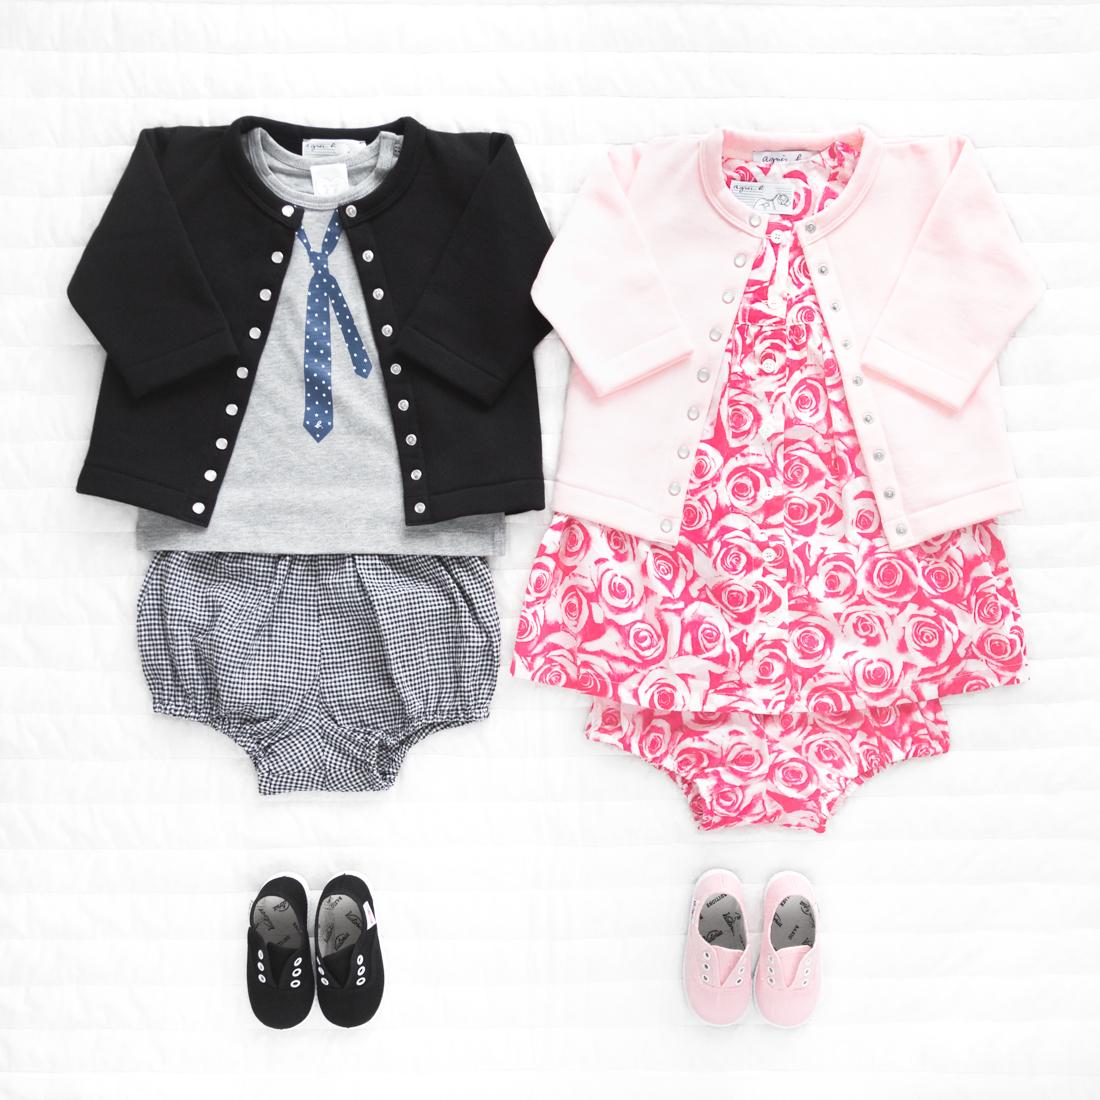 1100_minilooks_blog_mode_bebe_baby_fashionblog_copyright_PaulinePRIVEZ_paulinefashionblog_com-5